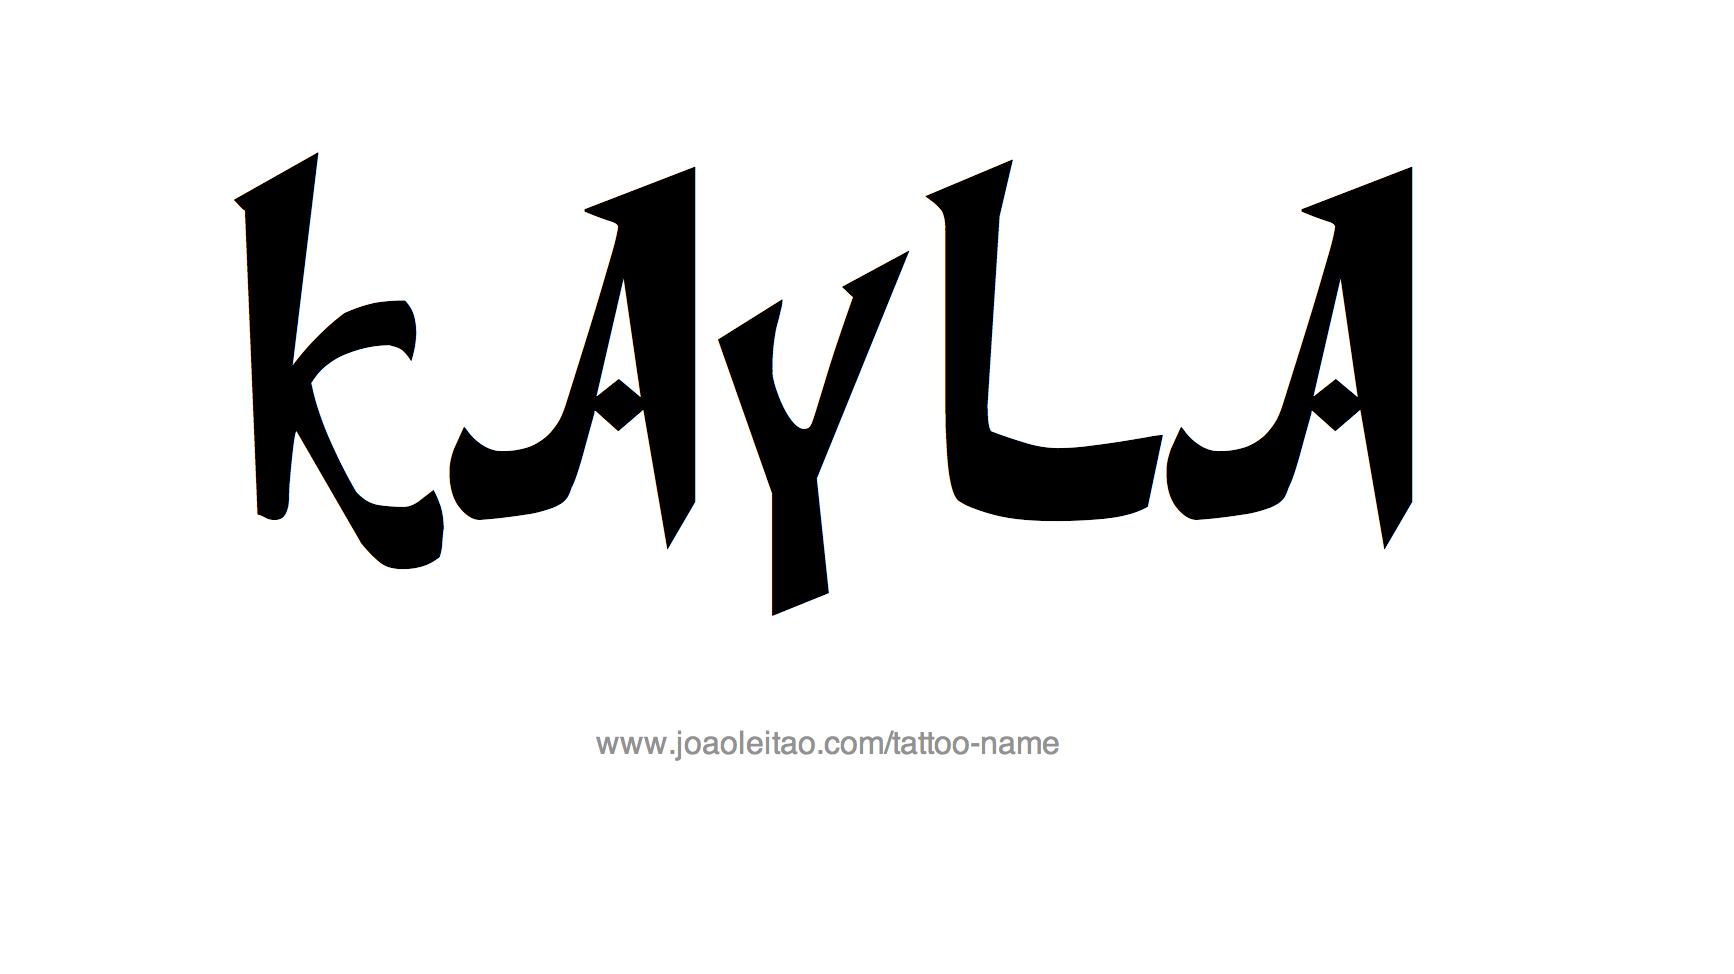 Tattoo Design Name Kayla